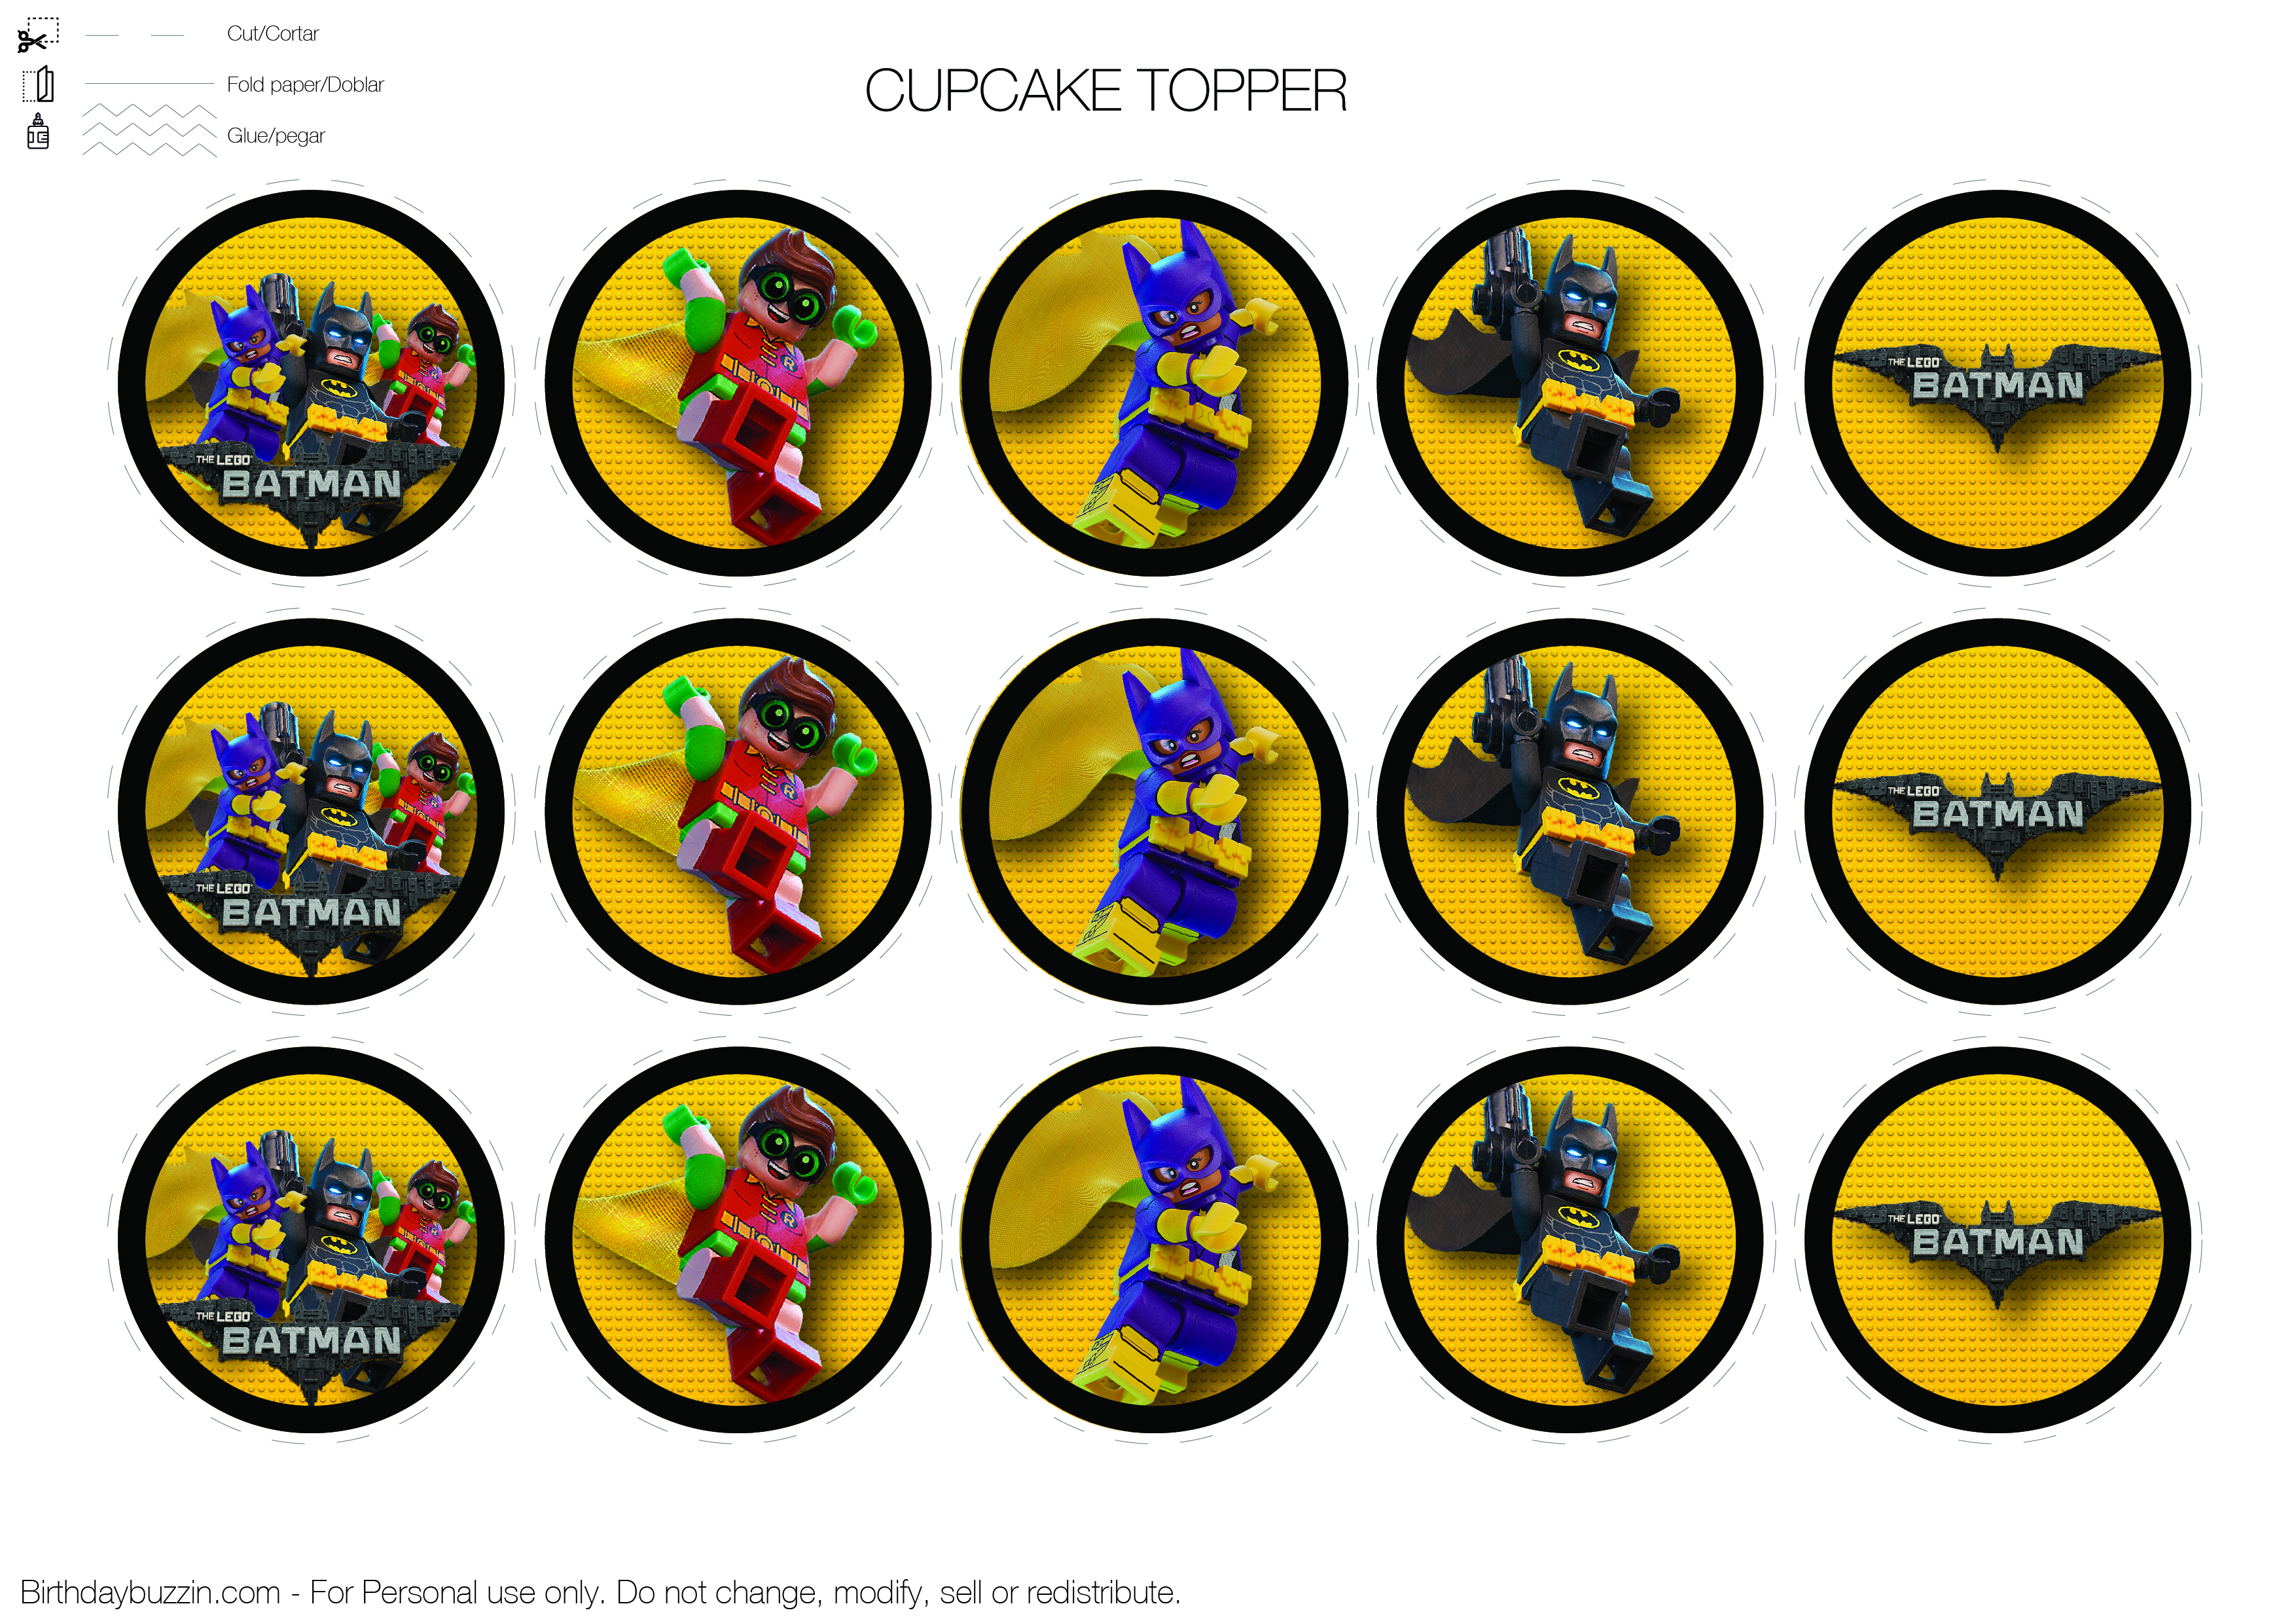 Lego-Batman-Cupcake-Topper | Birthday Buzzin - Free Printable Lego Batman